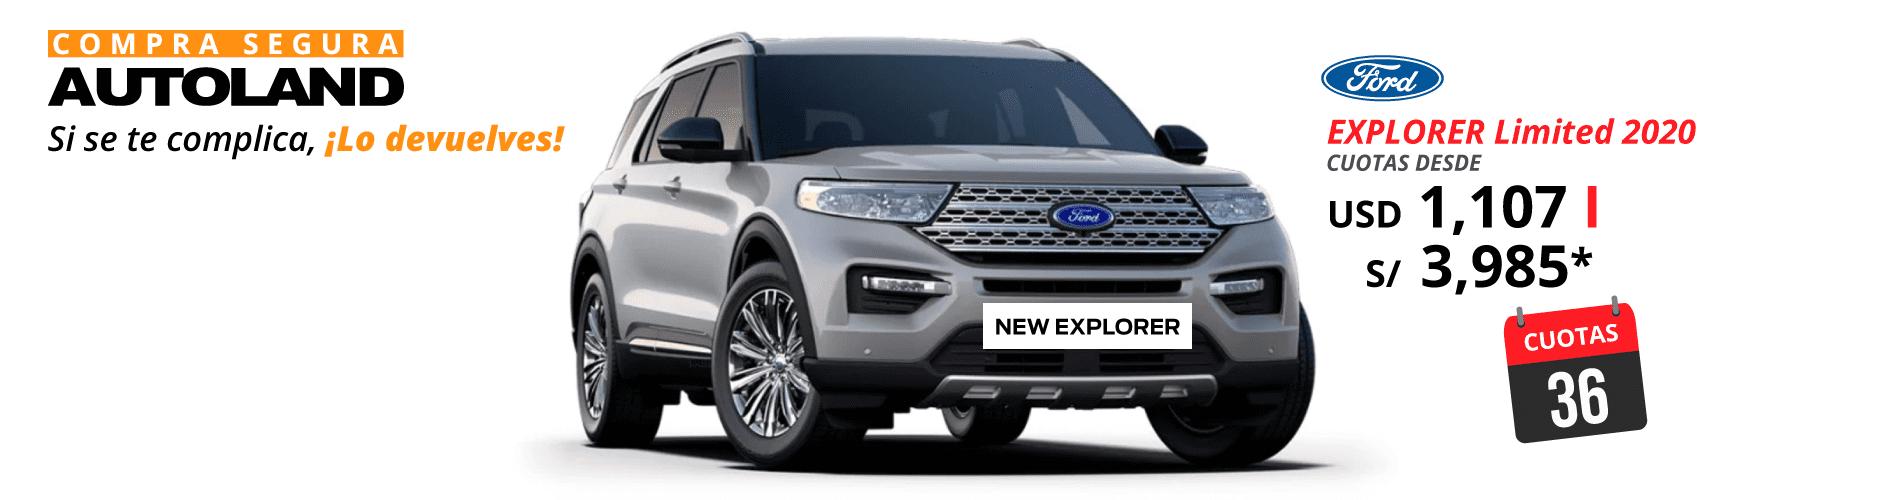 36 cuotas explorer limited